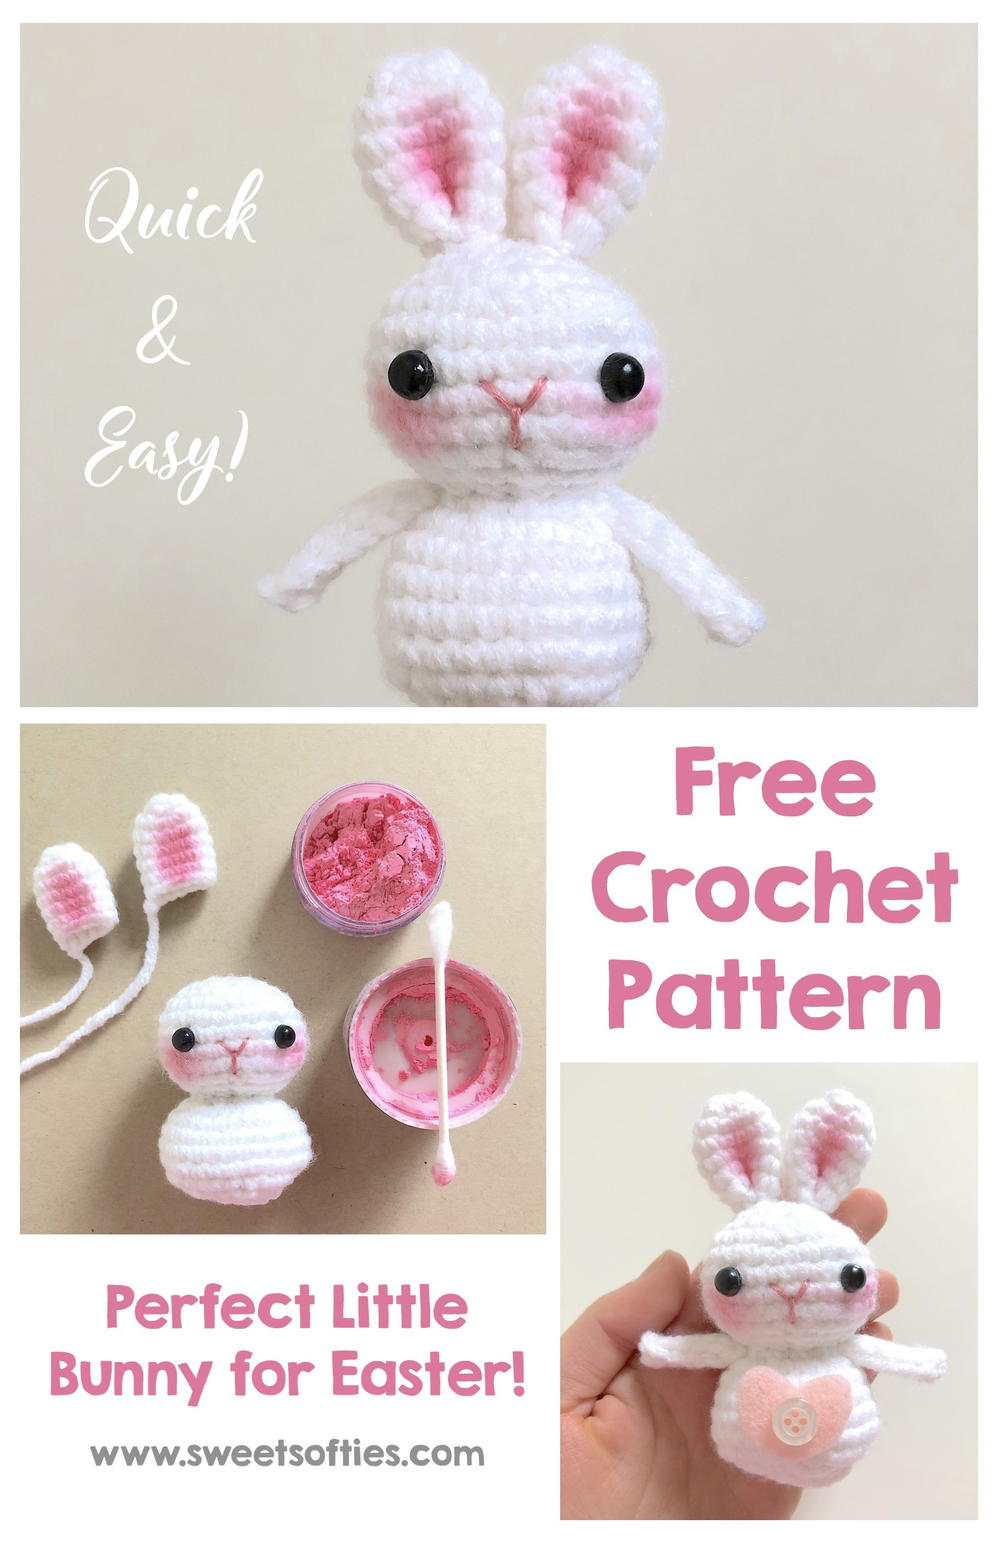 Baby Bunnies - three amigurumi bunny crochet patterns : PlanetJune ...   1542x1000